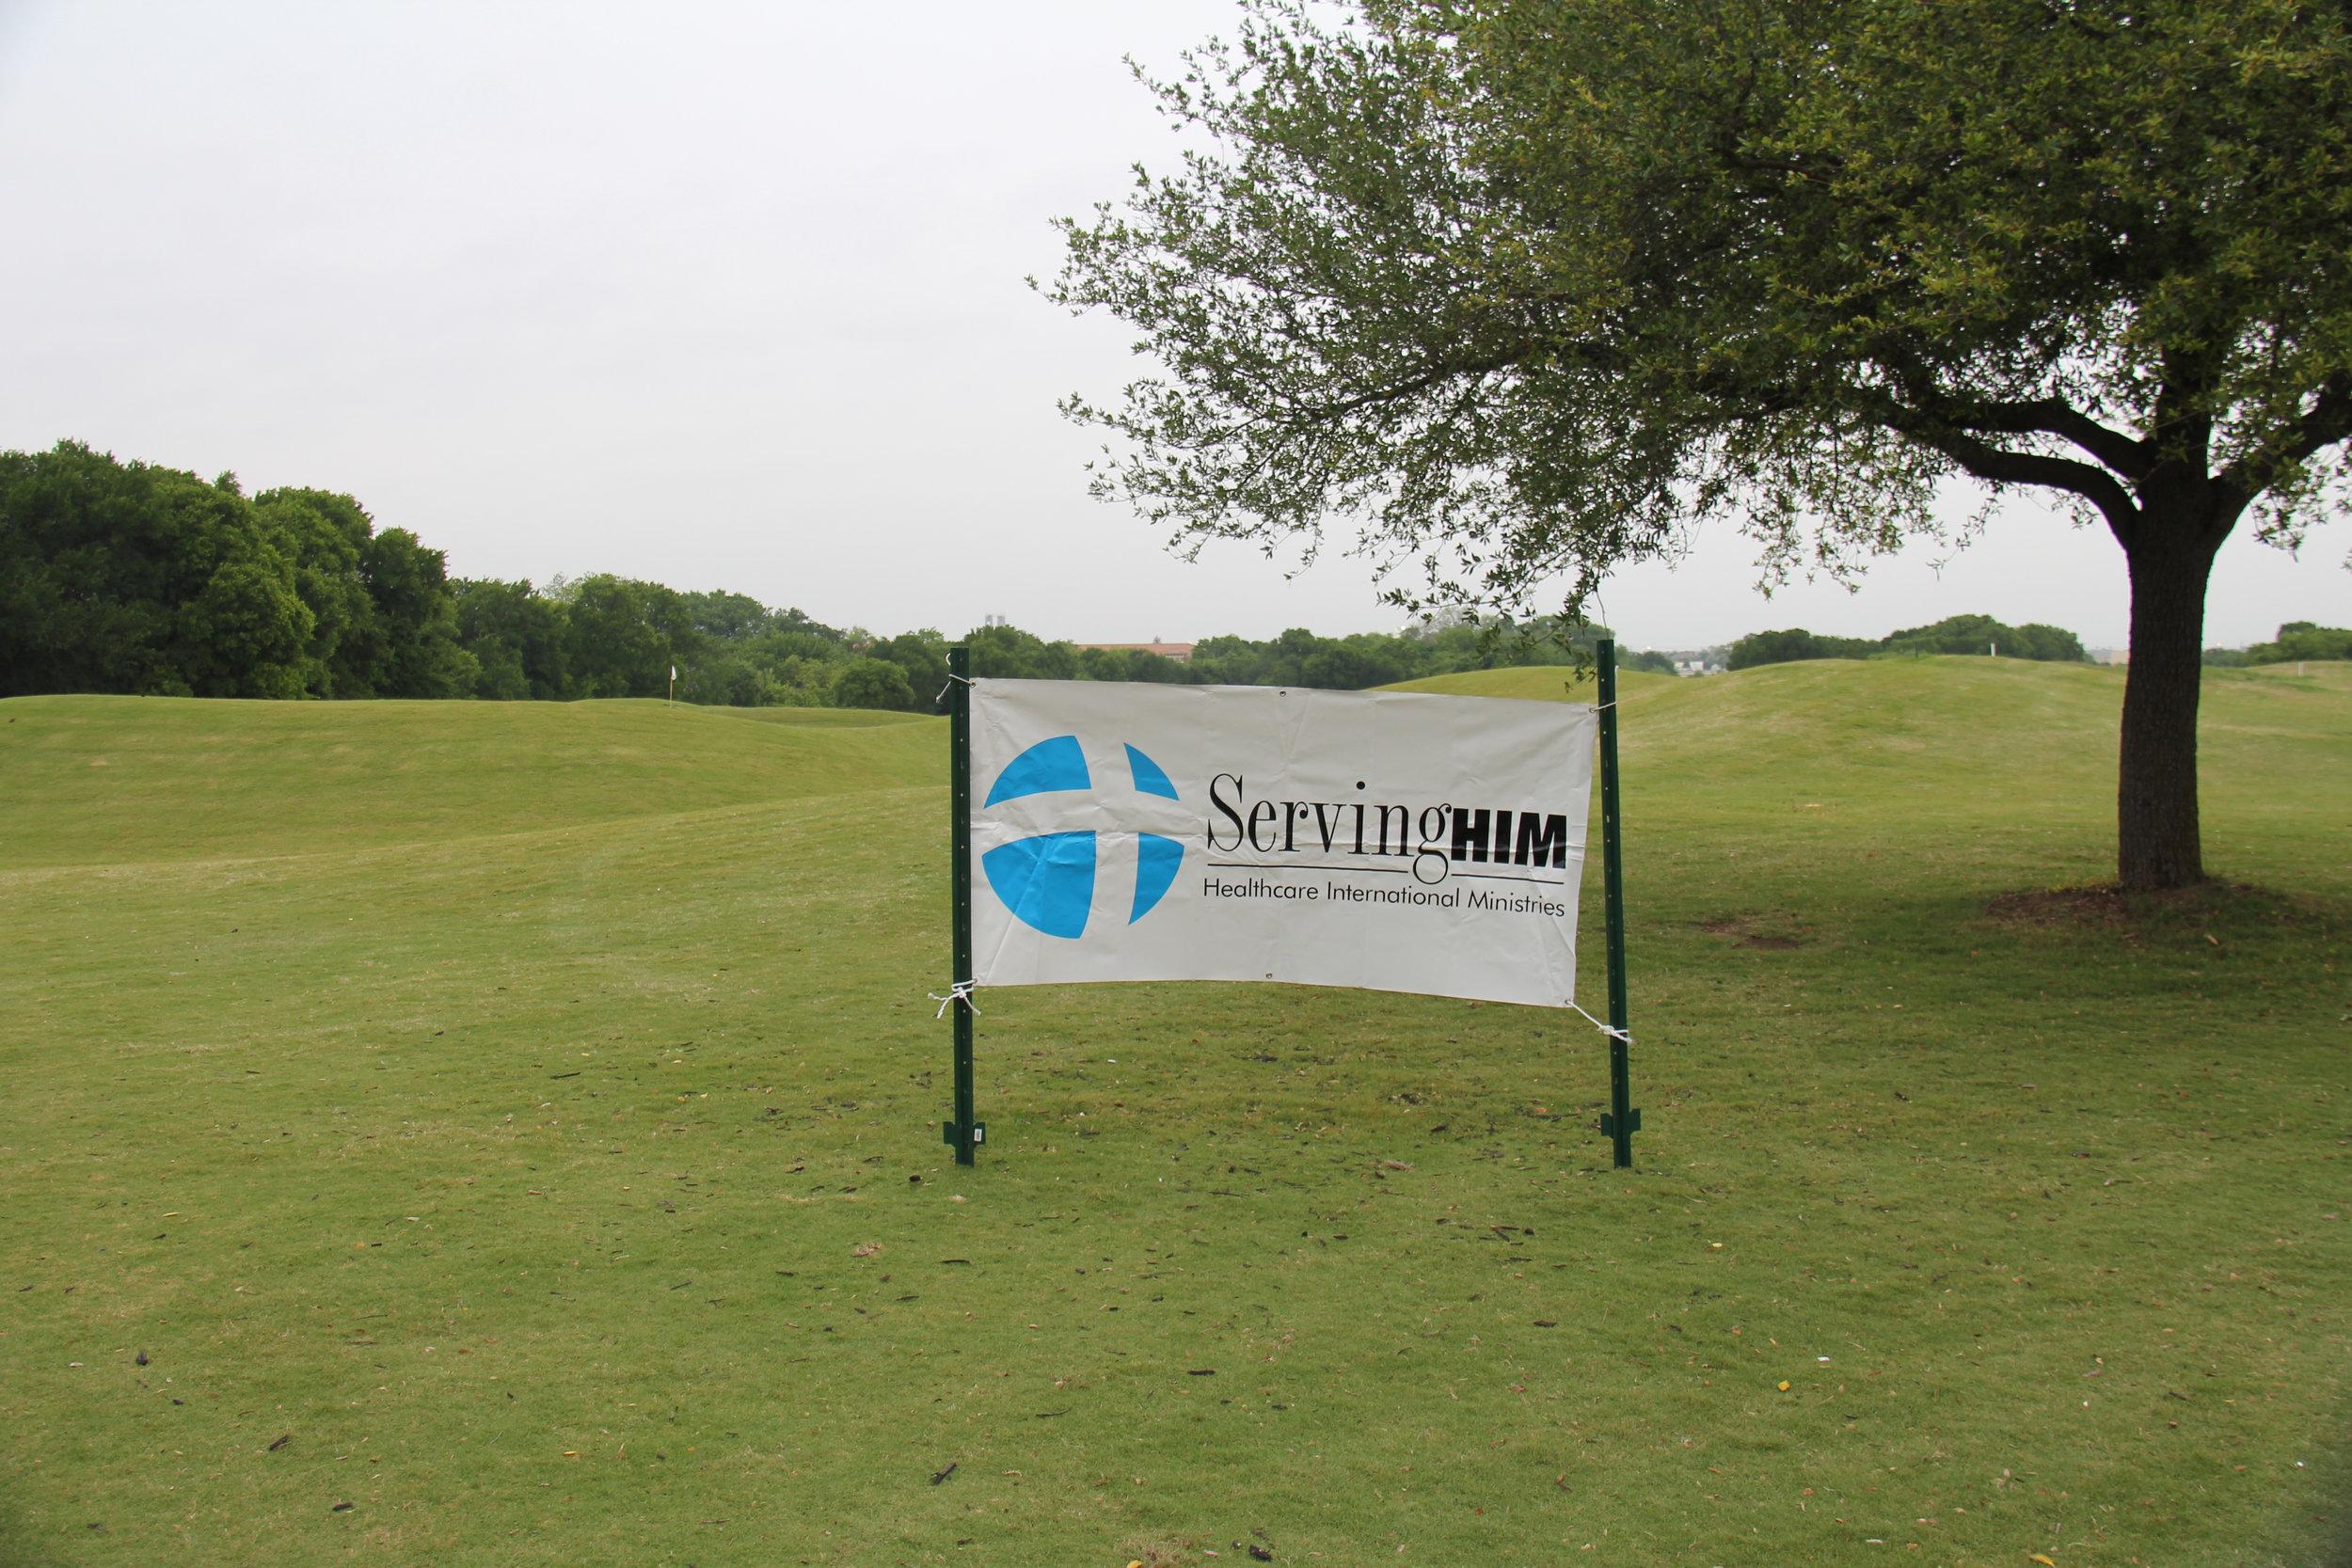 April 28, 2017 ServingHIM held it's Annual Golf Tournament Fundraiser. 18 teams participated.